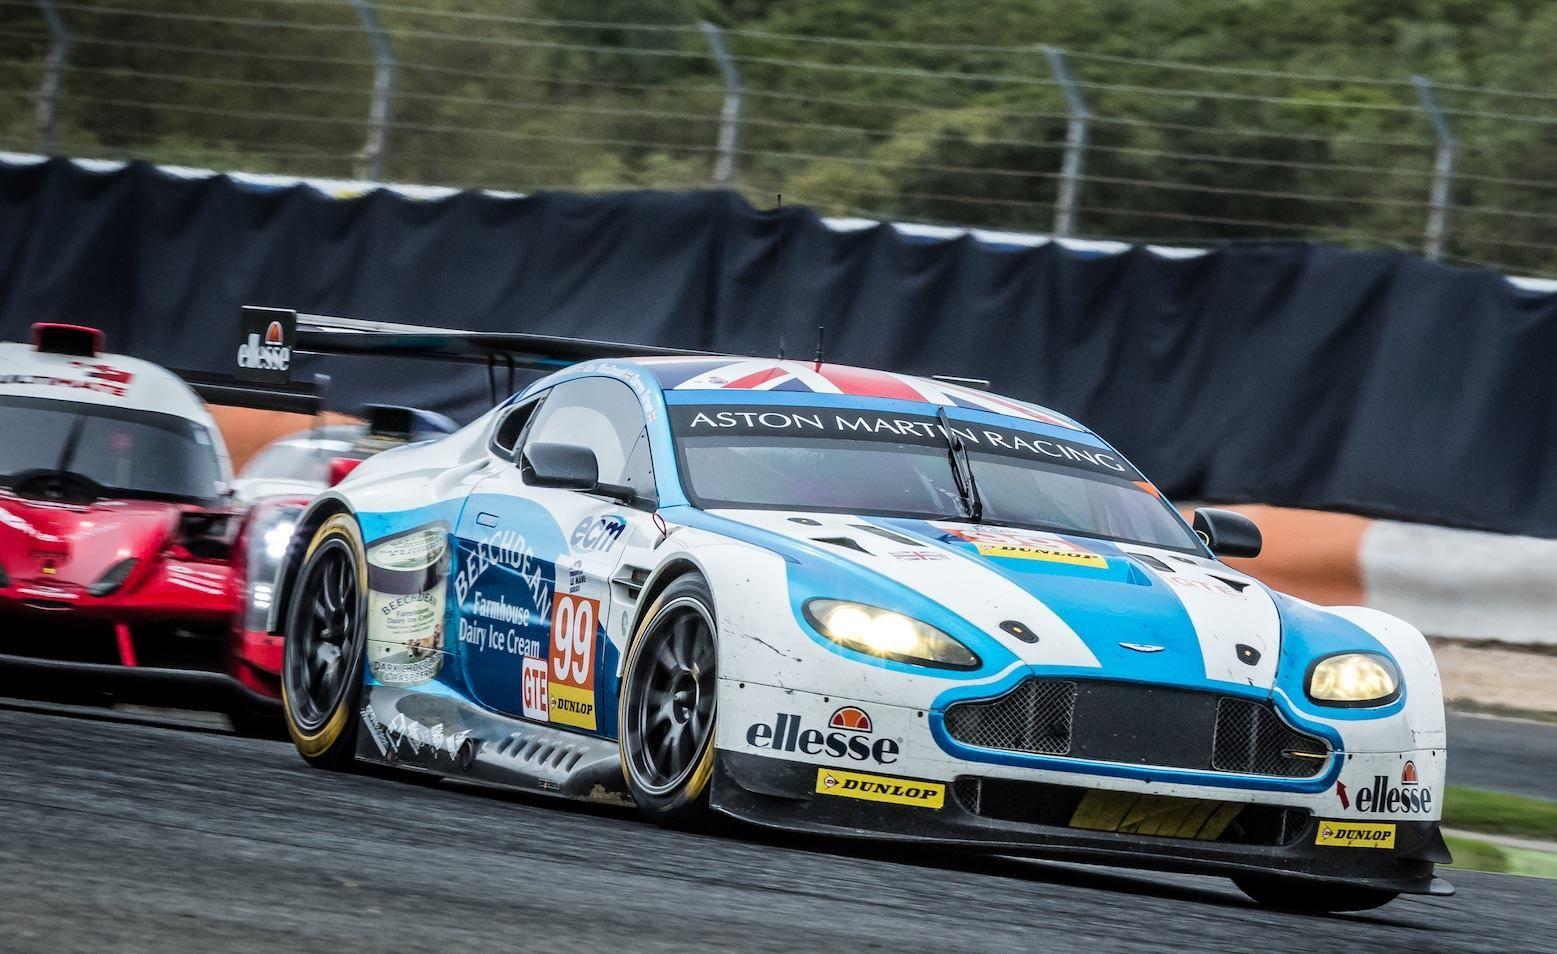 Aston Martin Racing : Champion EUROPEAN LE MANS SERIES GTE !